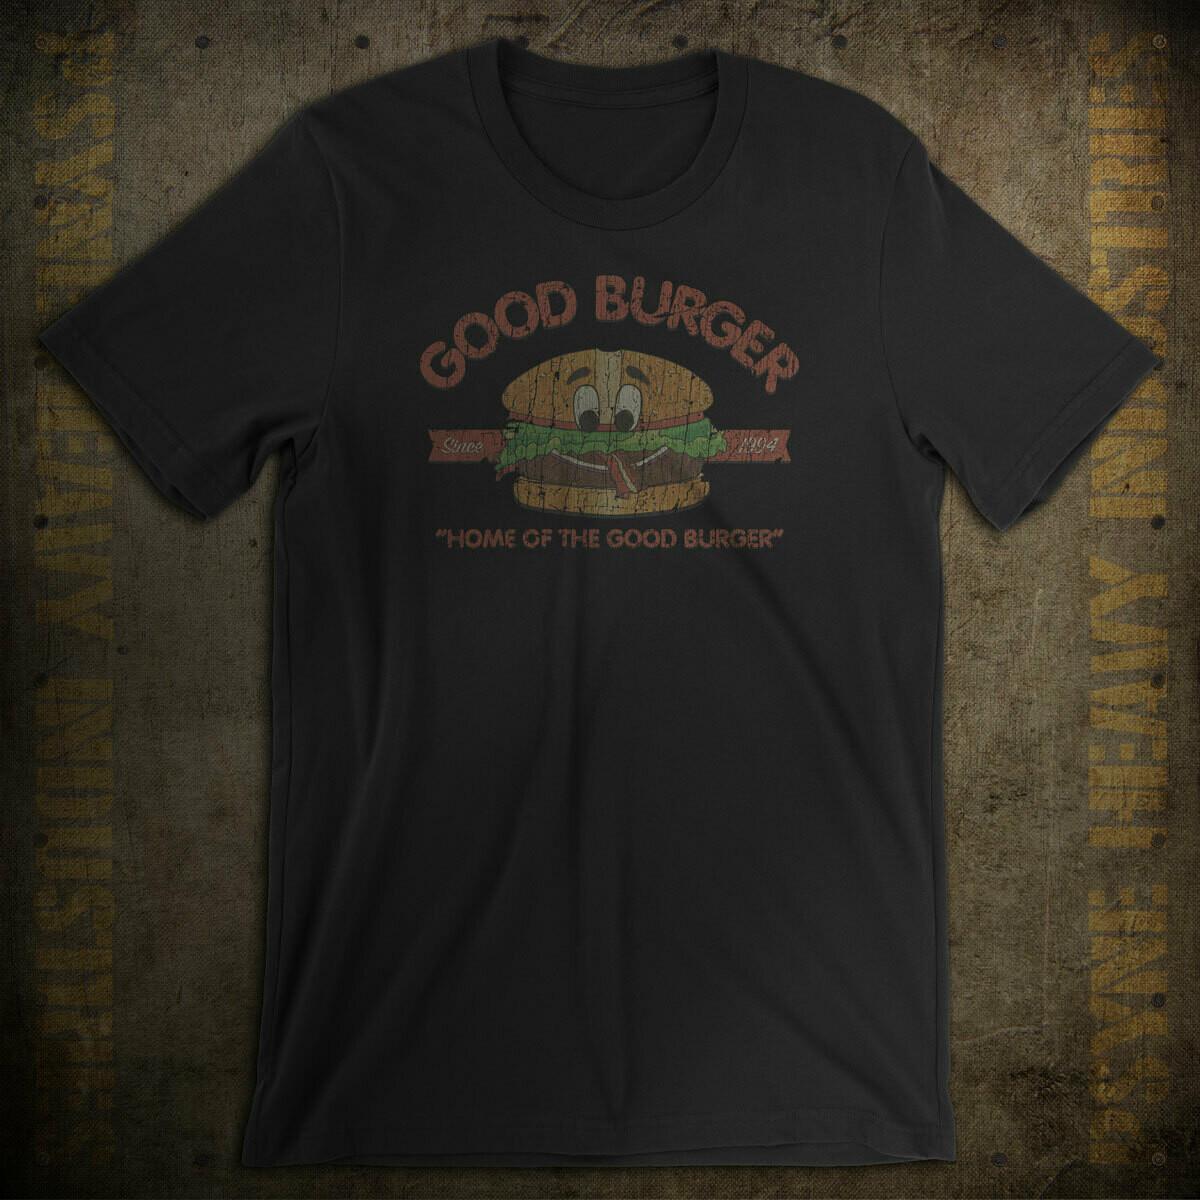 Good Burger 1994 Vintage T-Shirt